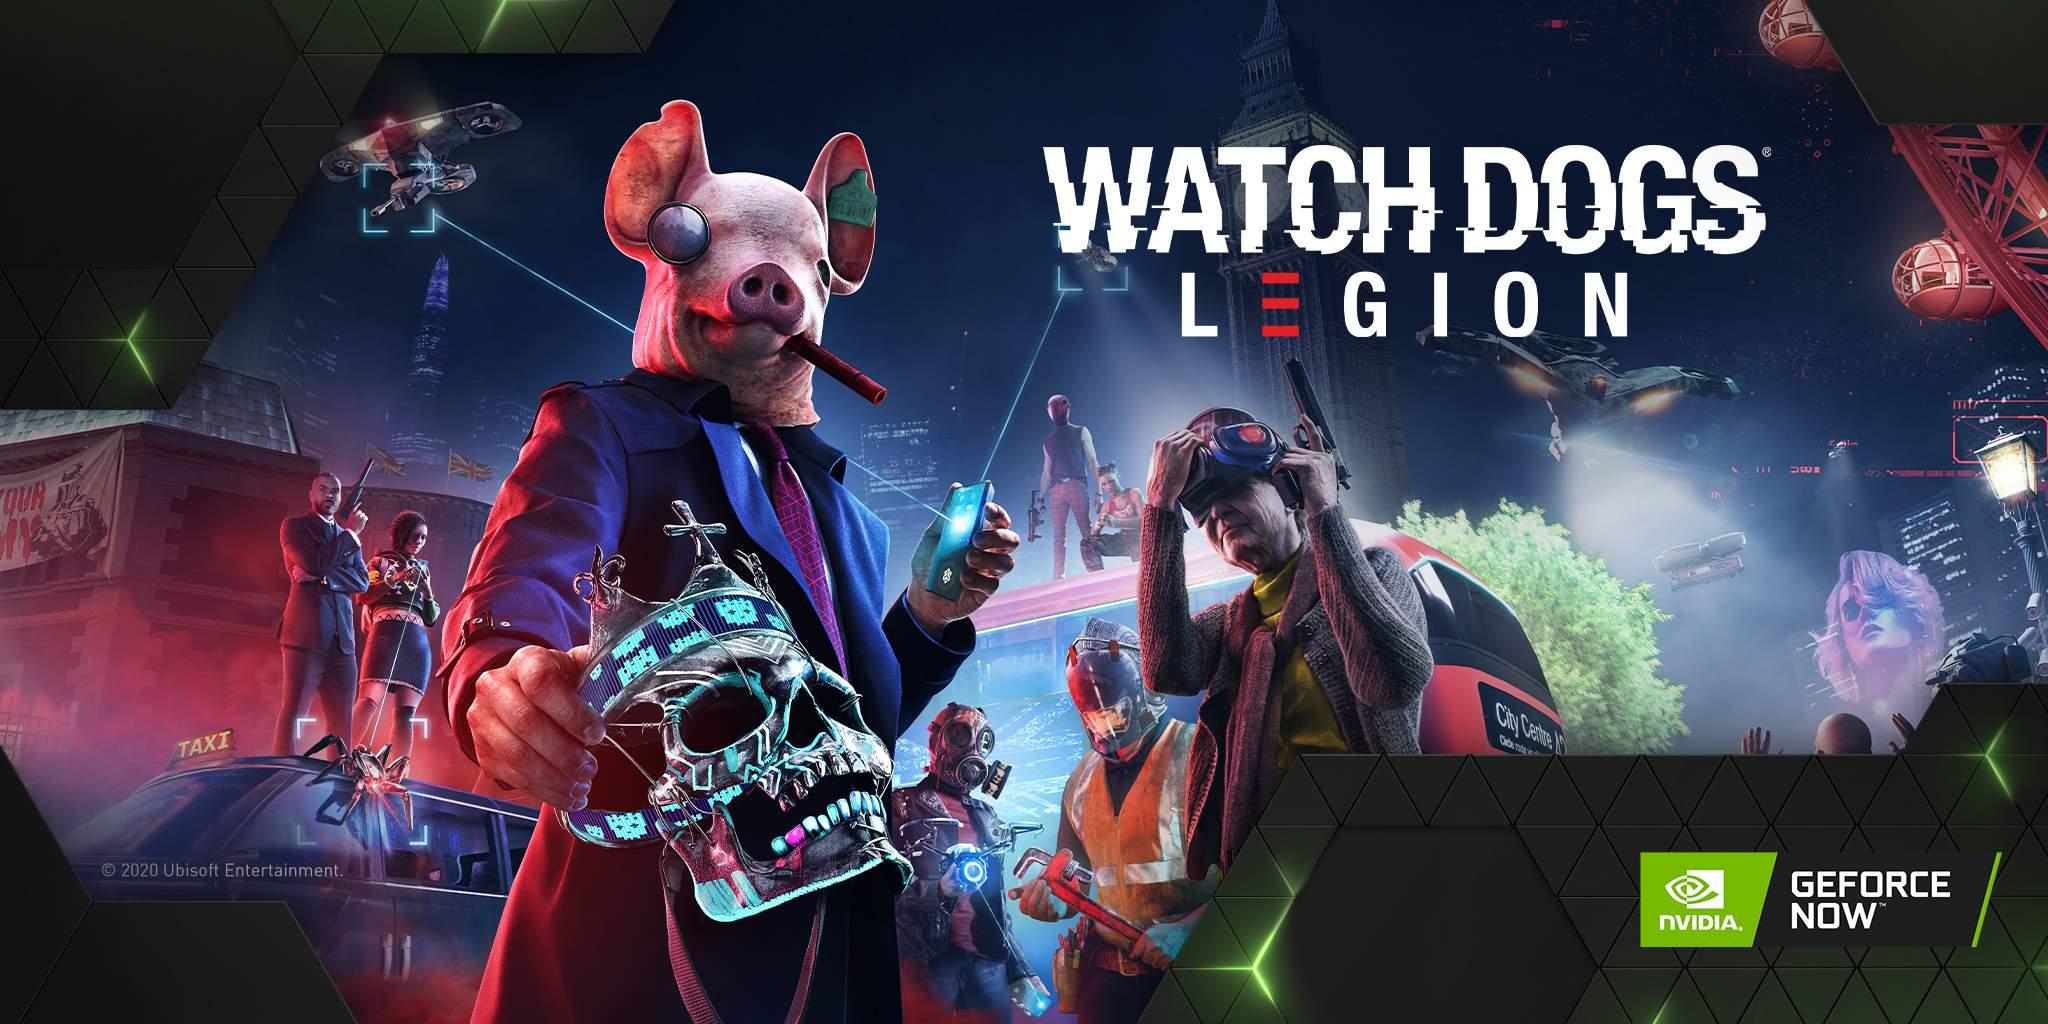 Watch Dogs: Legion ? Game Ready su GeForce NOW